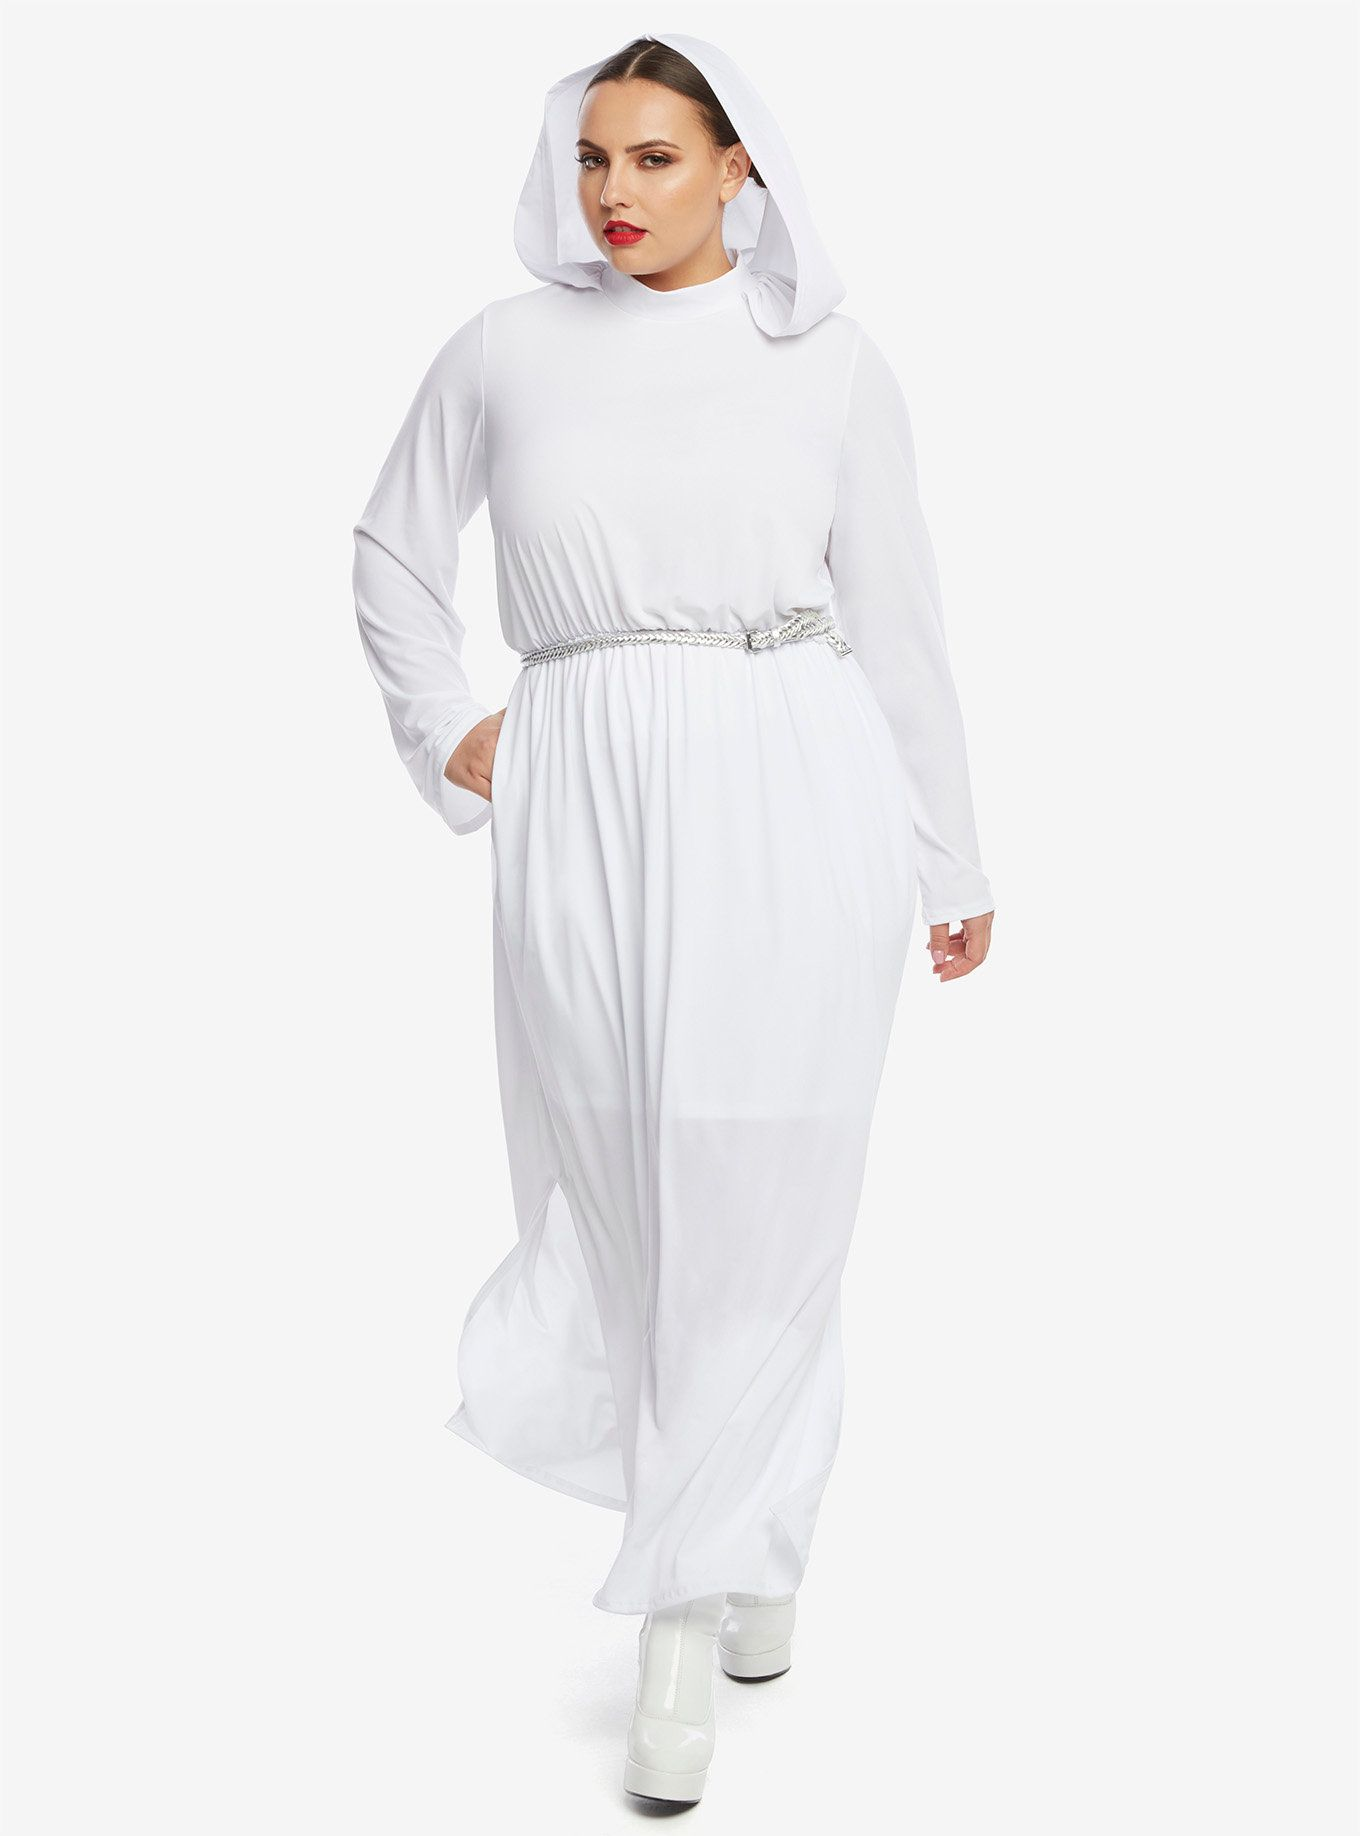 u003c\u003eu003cu003eu003cbru003eu003c\u003eu003cu003ePay homage to the princess of our hearts and the heroine of the rebellion Princess Leia in this white cosplay dress from Her ...  sc 1 st  Pinterest & u003eHelp me Obi-Wan Kenobi youu0027re my only hope...u003c\u003eu003cu003eu003cbr ...